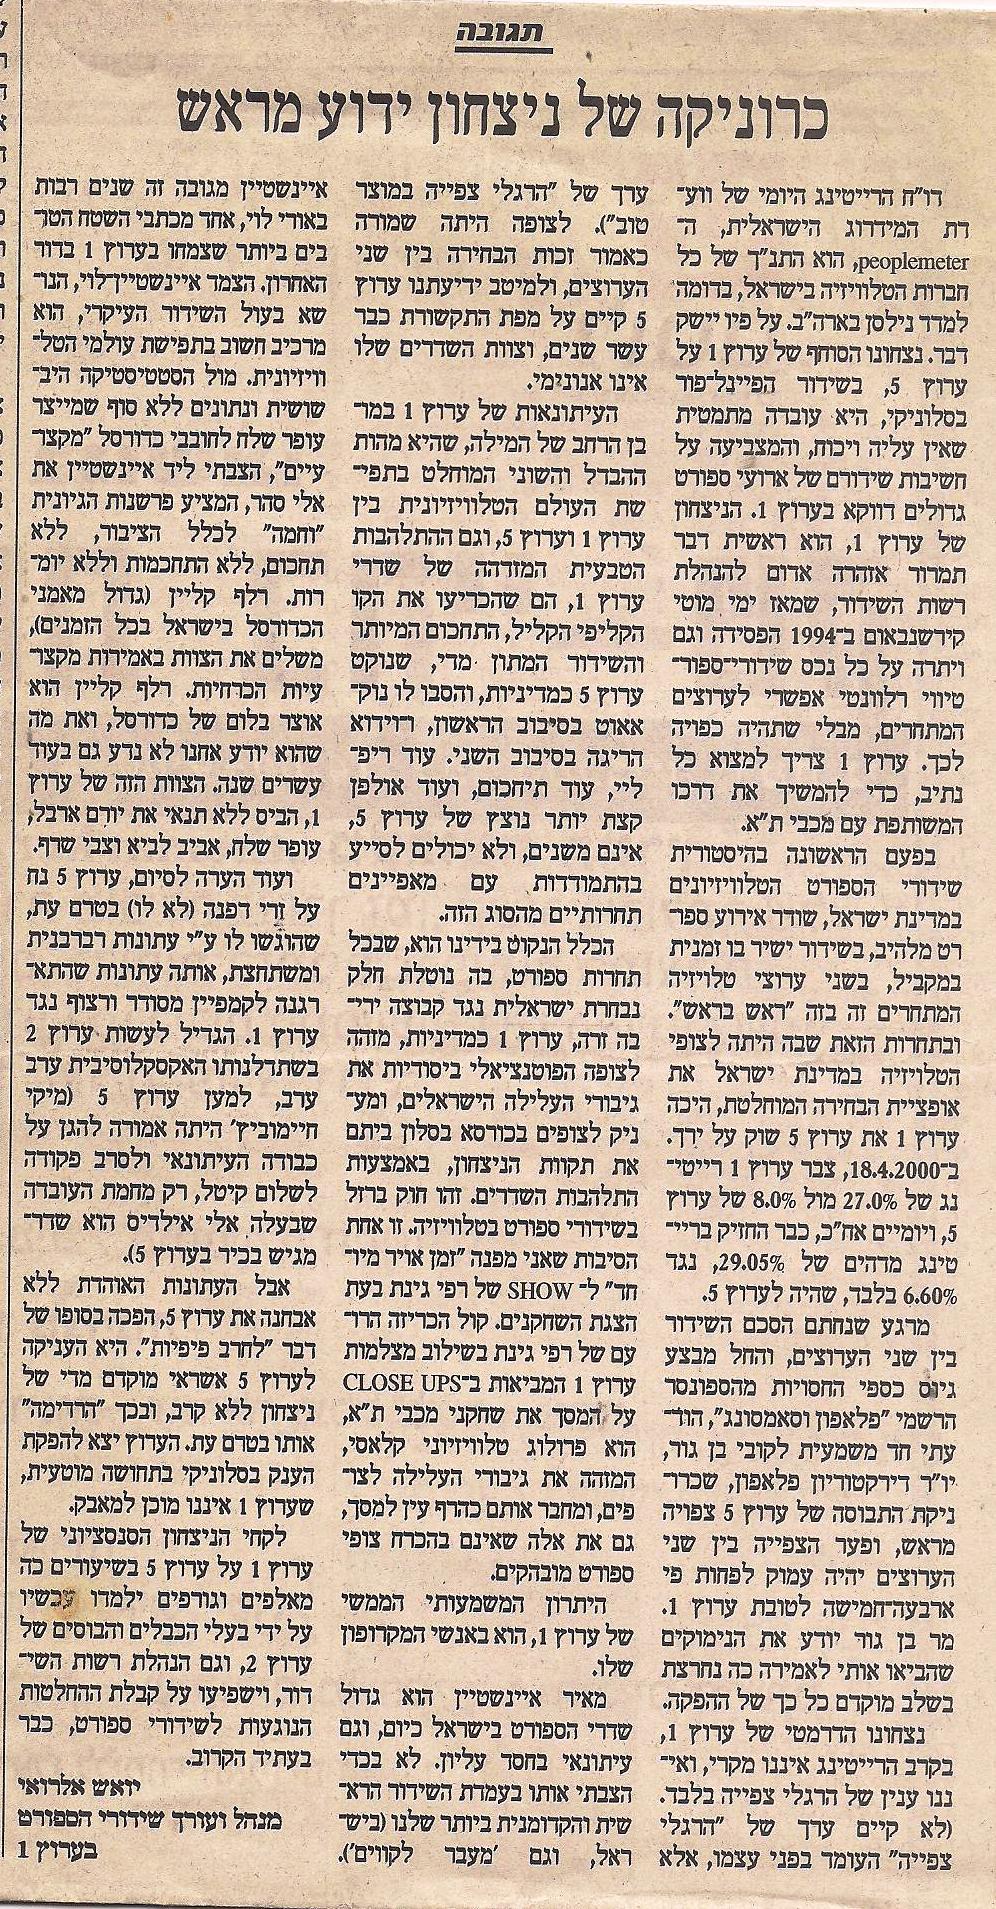 yoash kirshenbaum 2